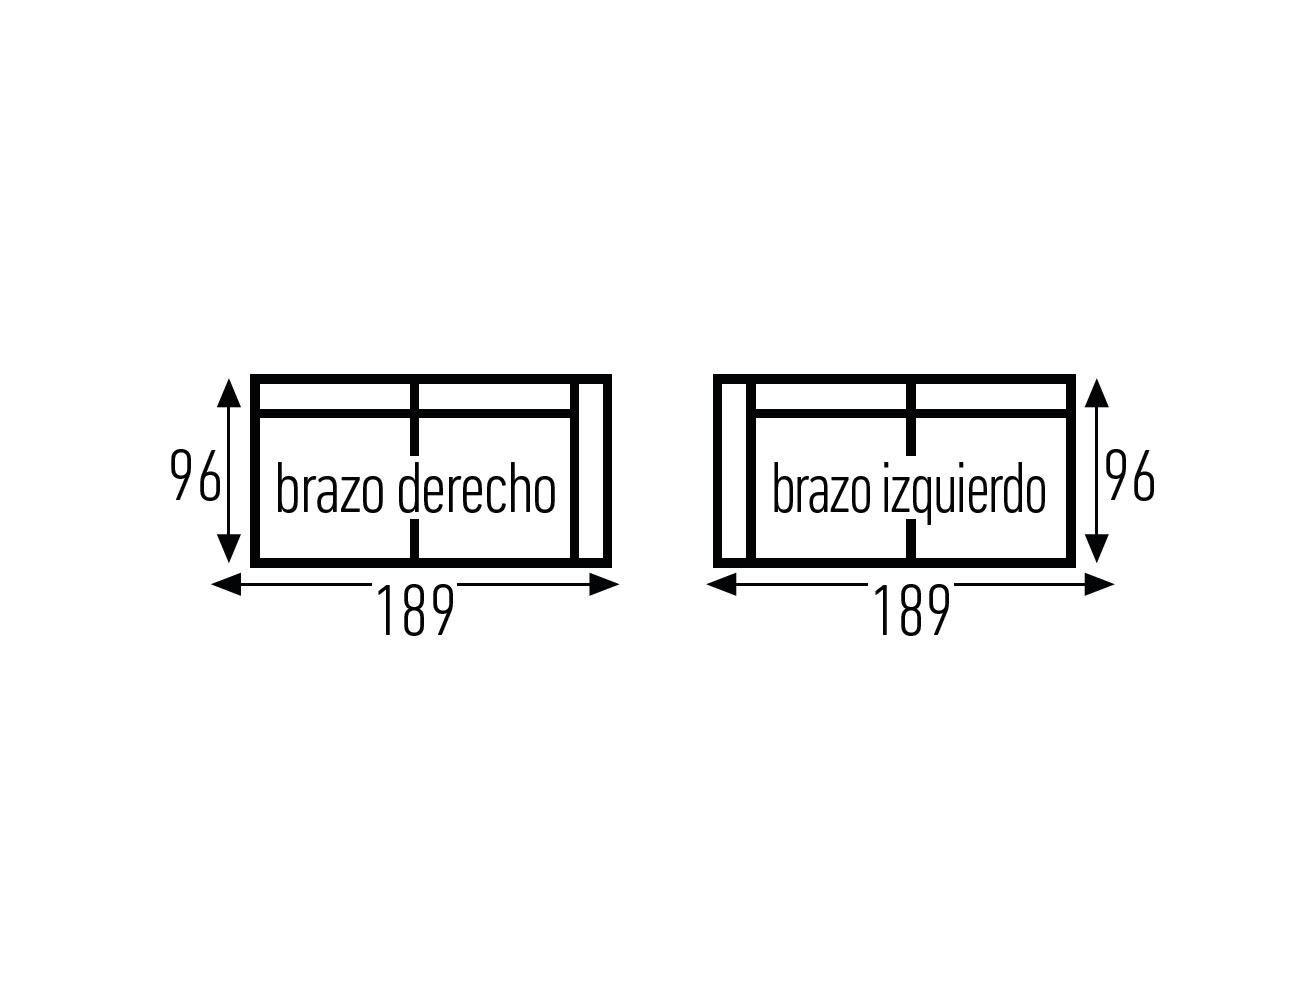 Croquis 3p sin 1 brazo 18914